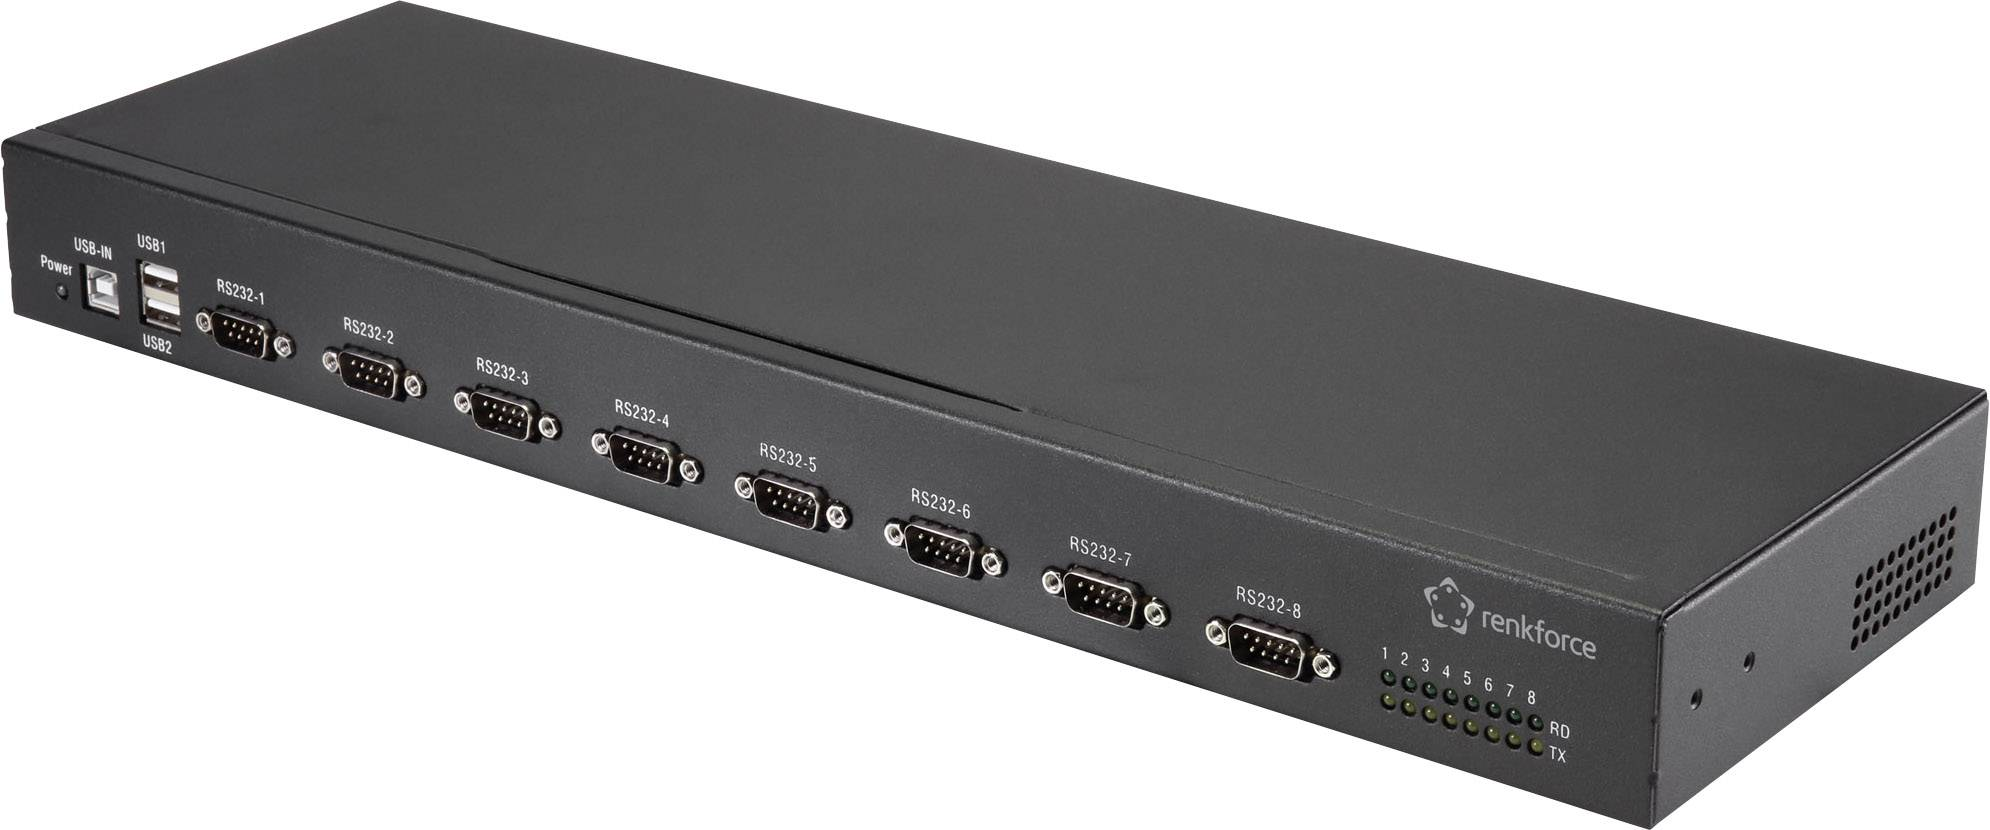 Renkforce RF-19-USB2-RS232-8 8